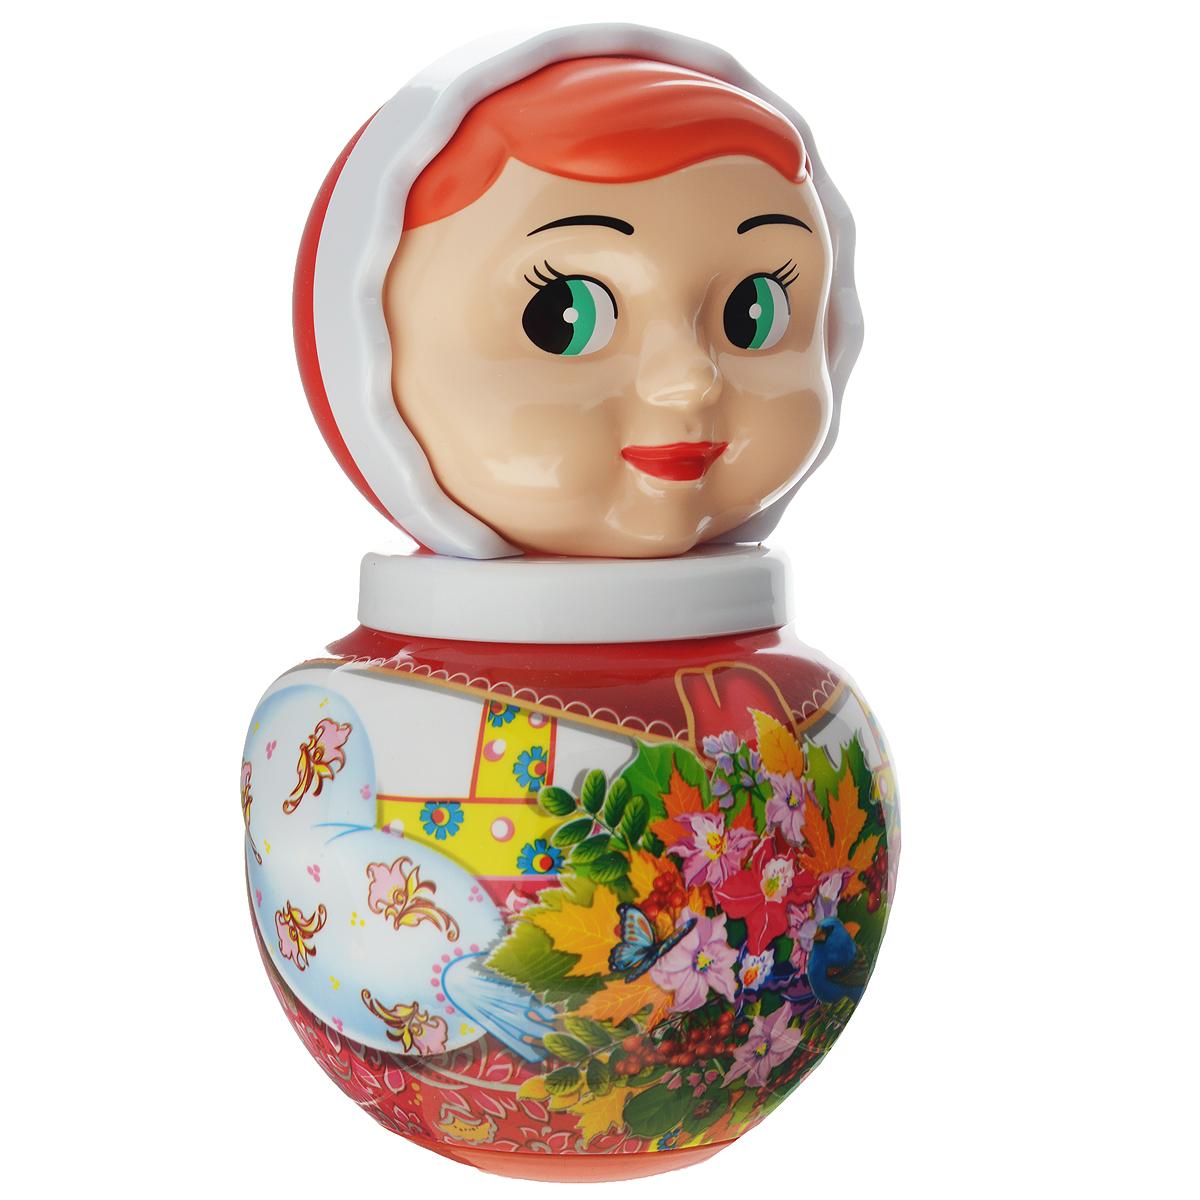 Stellar Неваляшка Аленушка цвет красный белый мягкие игрушки spiegelburg кролик неваляшка baby gluck